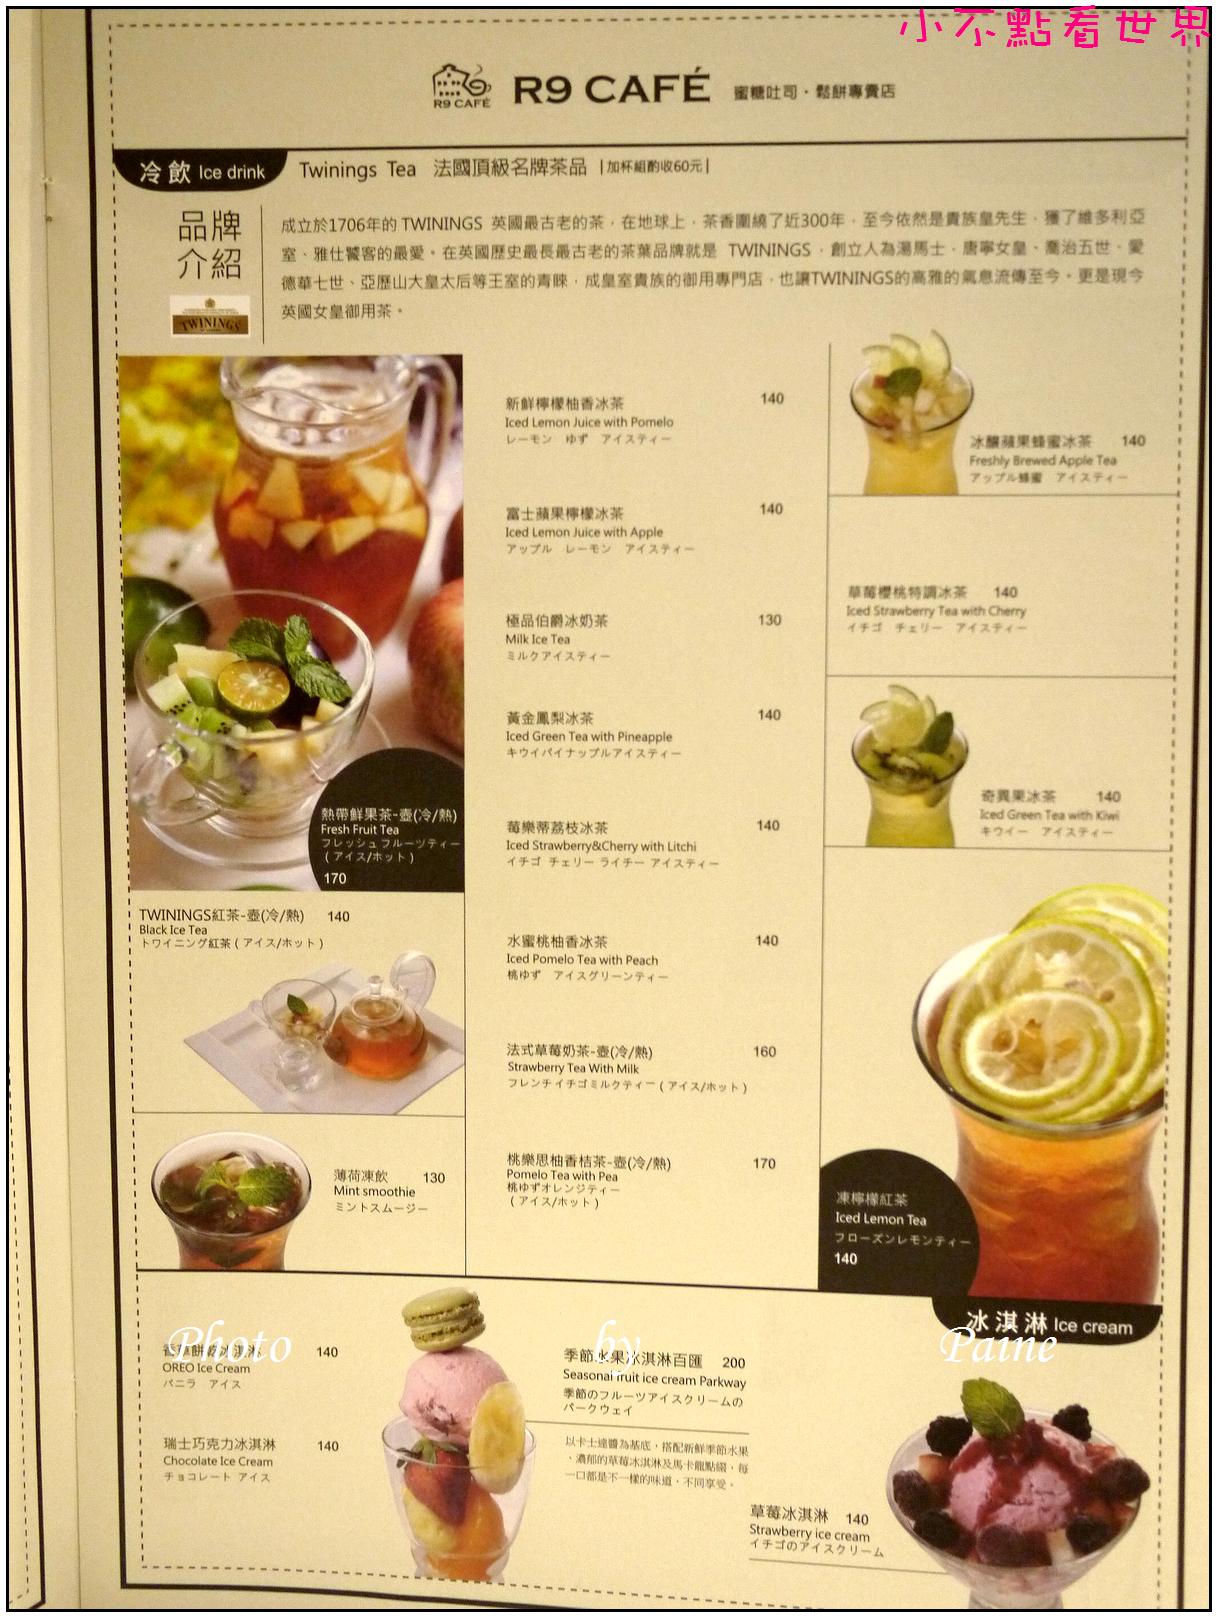 桃園R9 CAFE (17).JPG